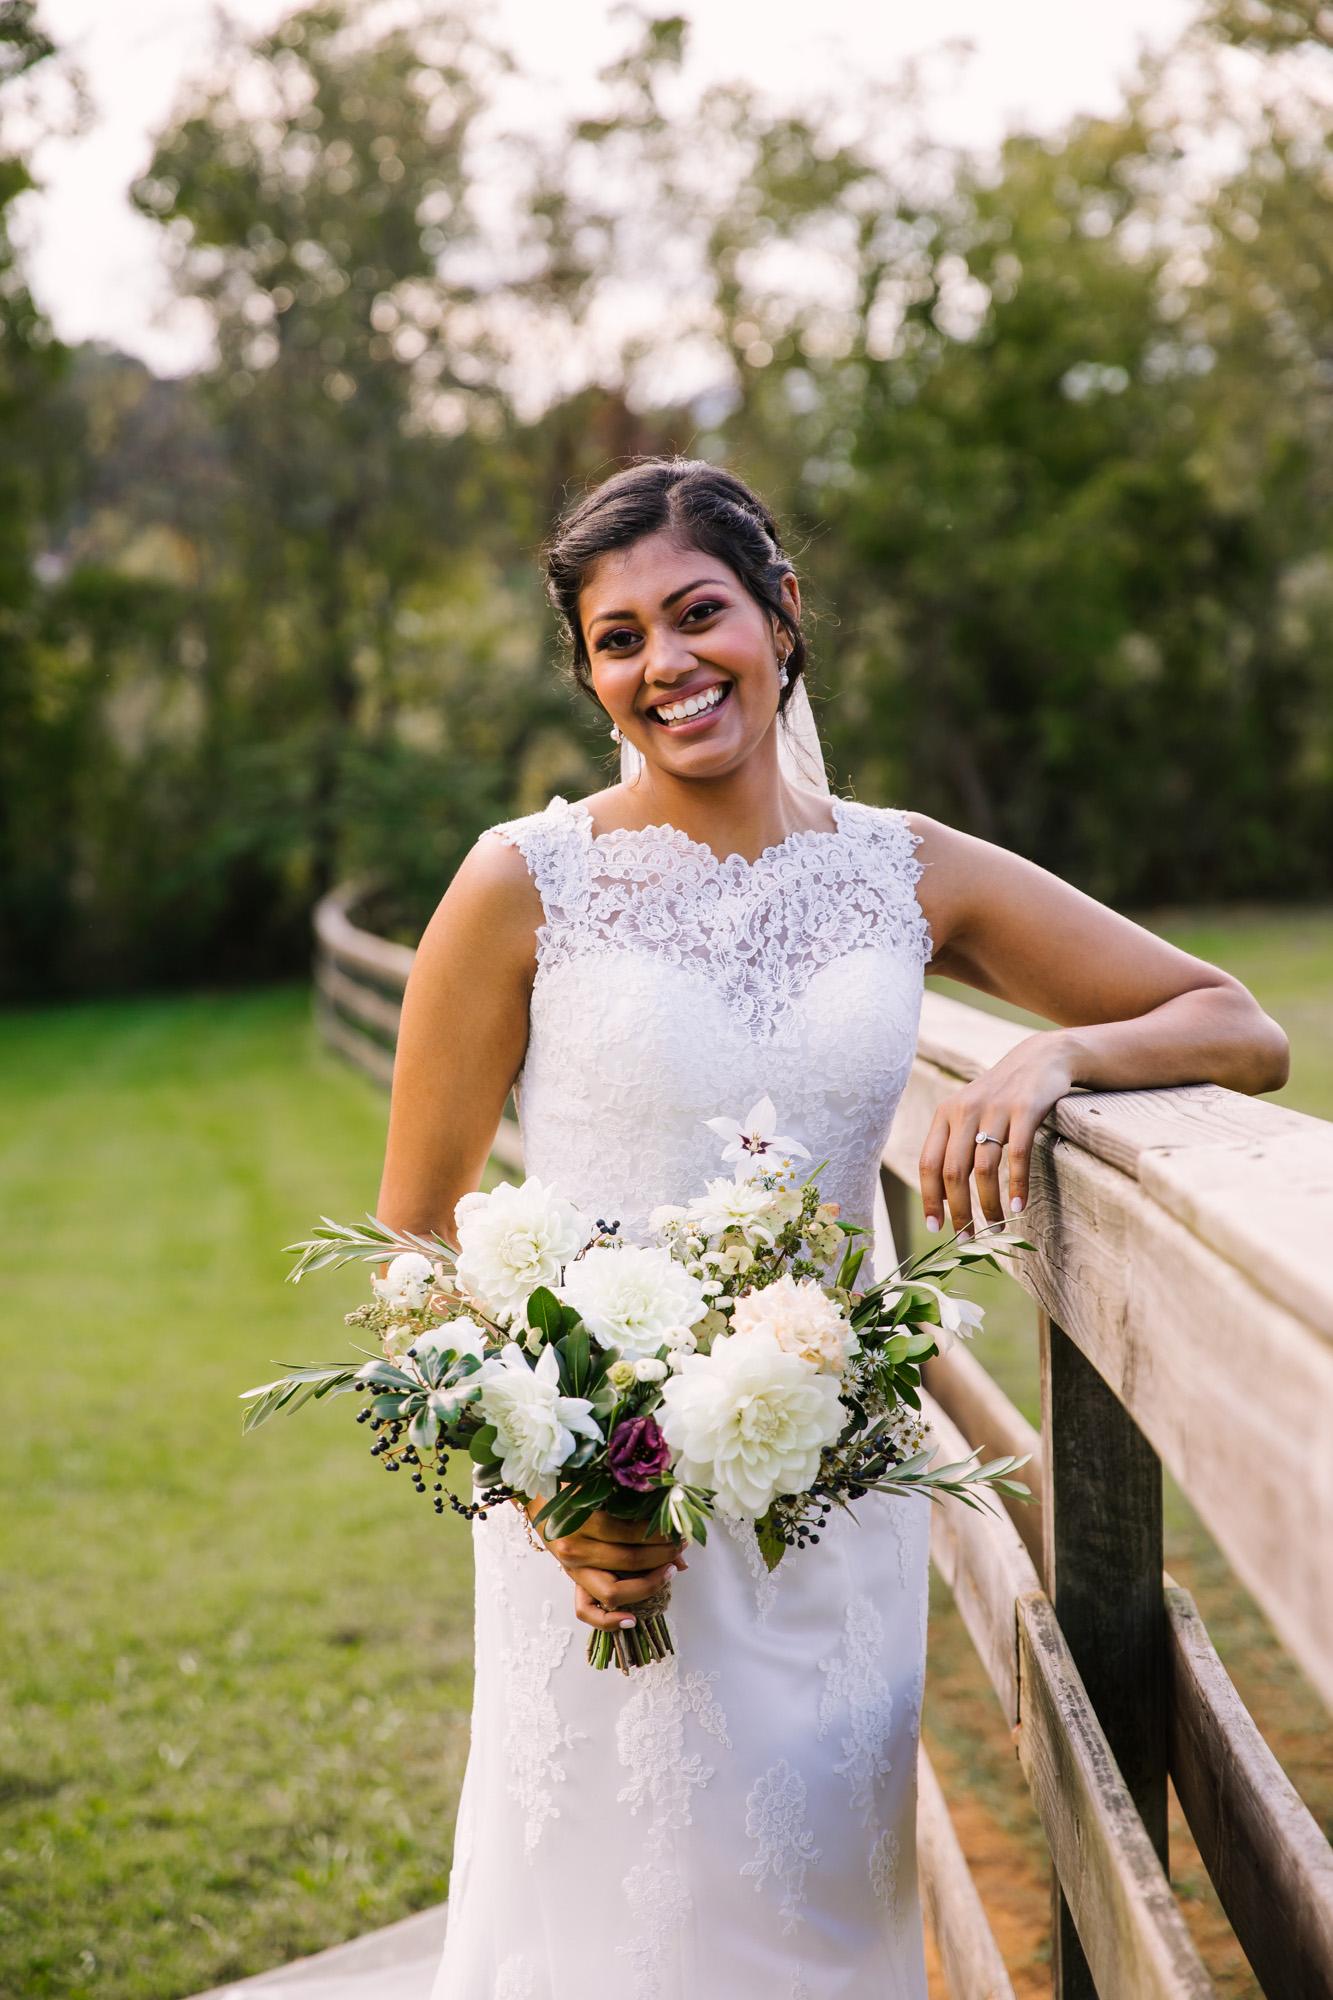 Waynesville NC Wedding Photography | Bride Solo Portrait Laughing